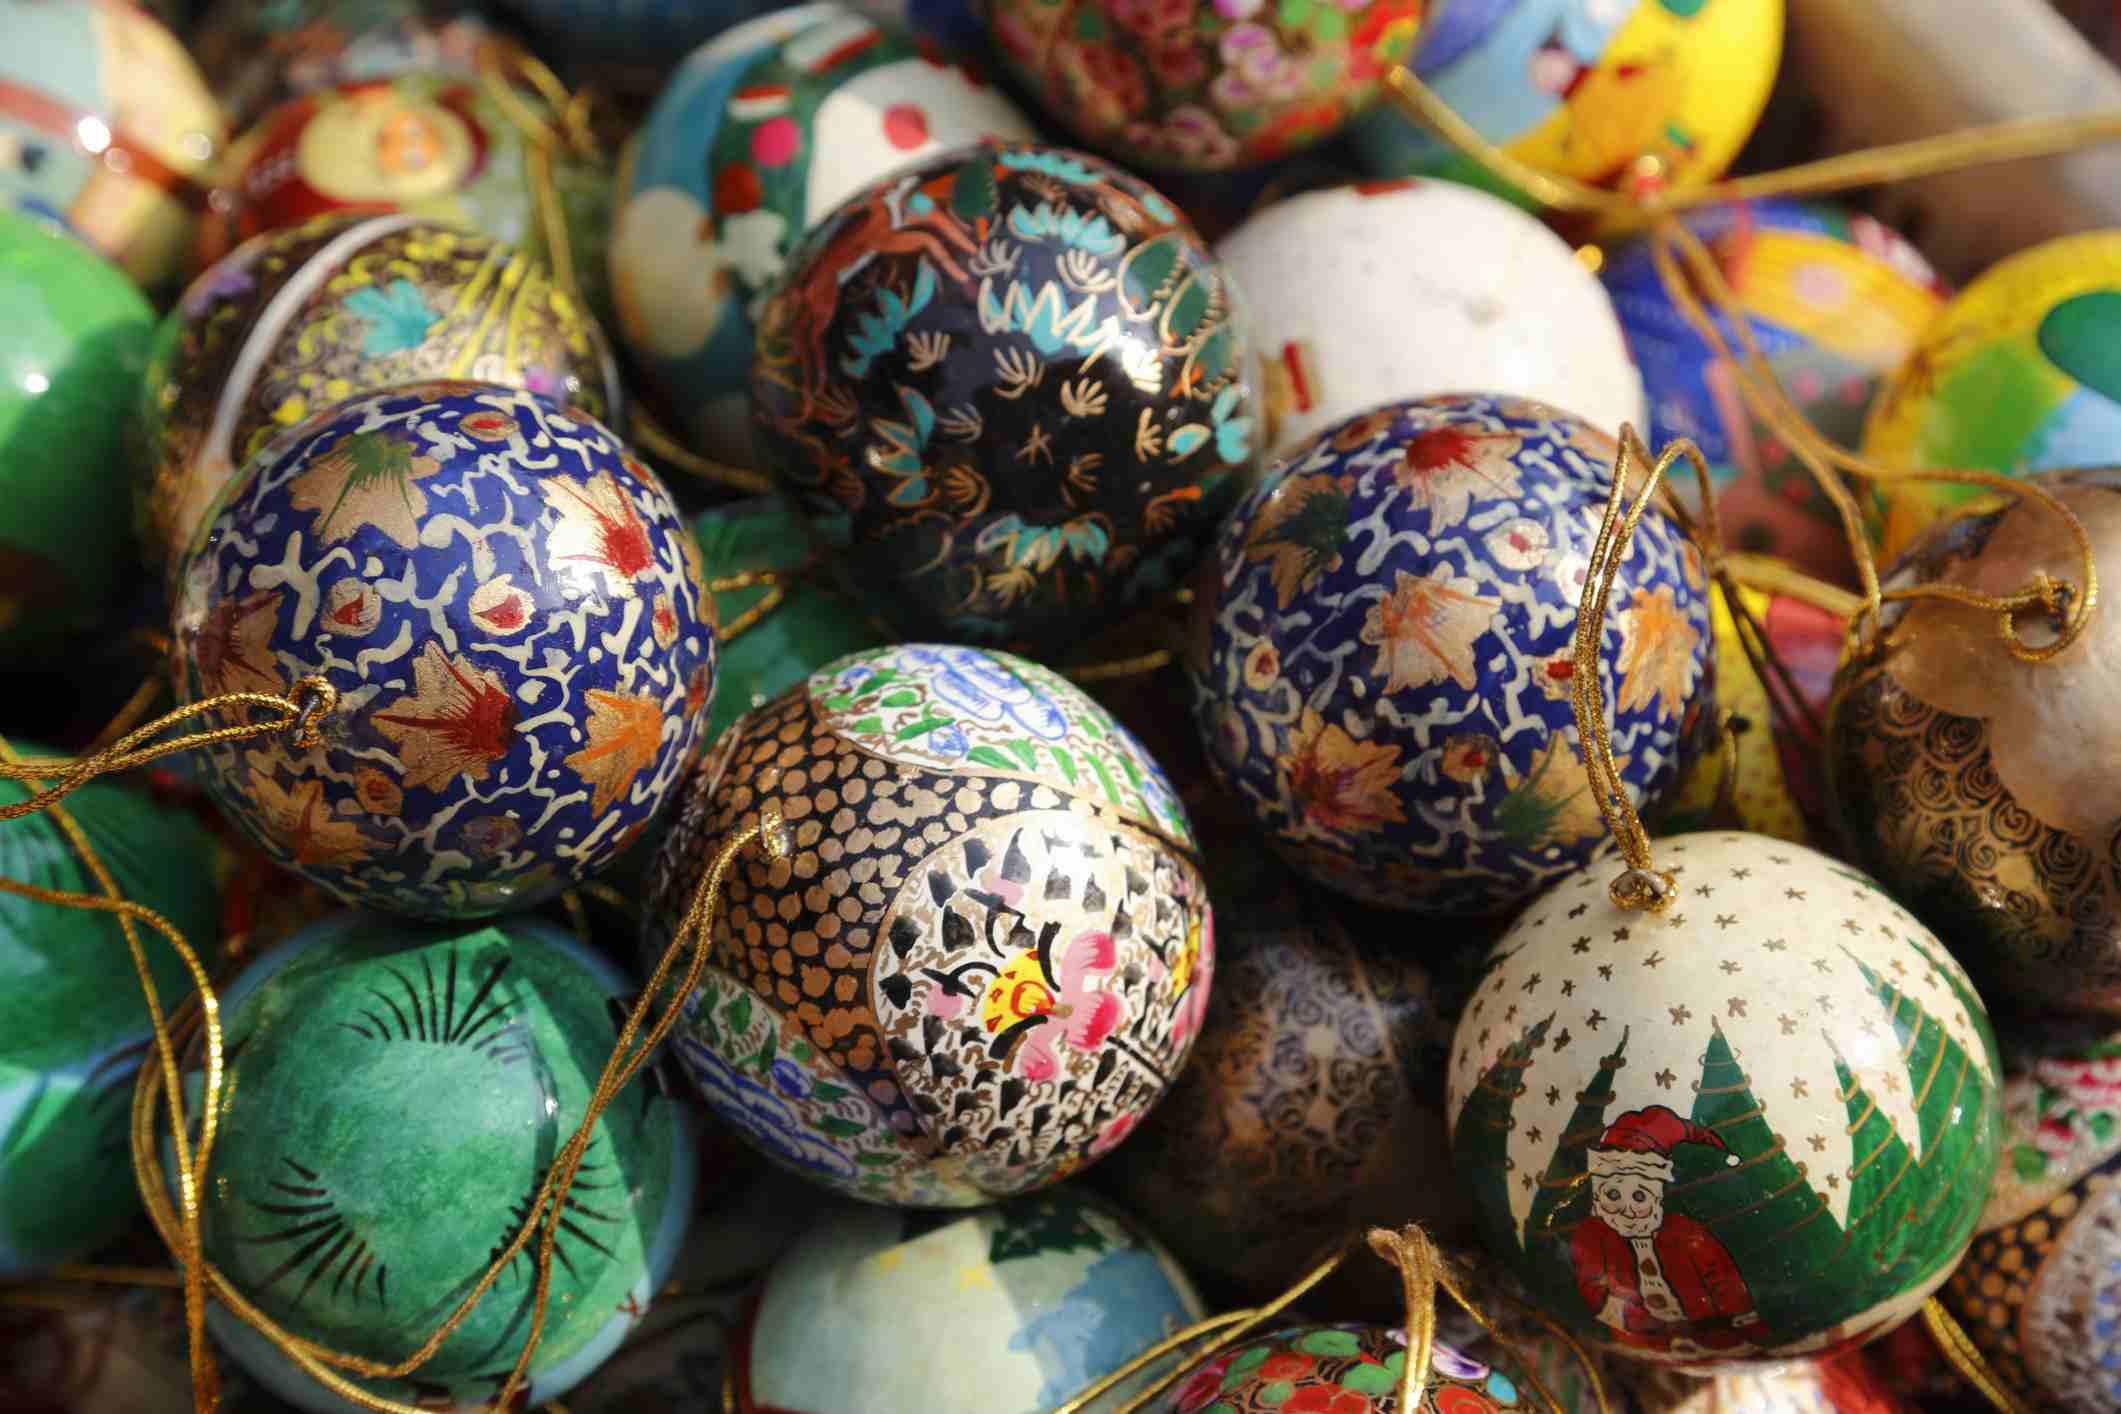 Kashmiri papier-mache Christmas baubles on sale at Dilli Haat crafts bazaar